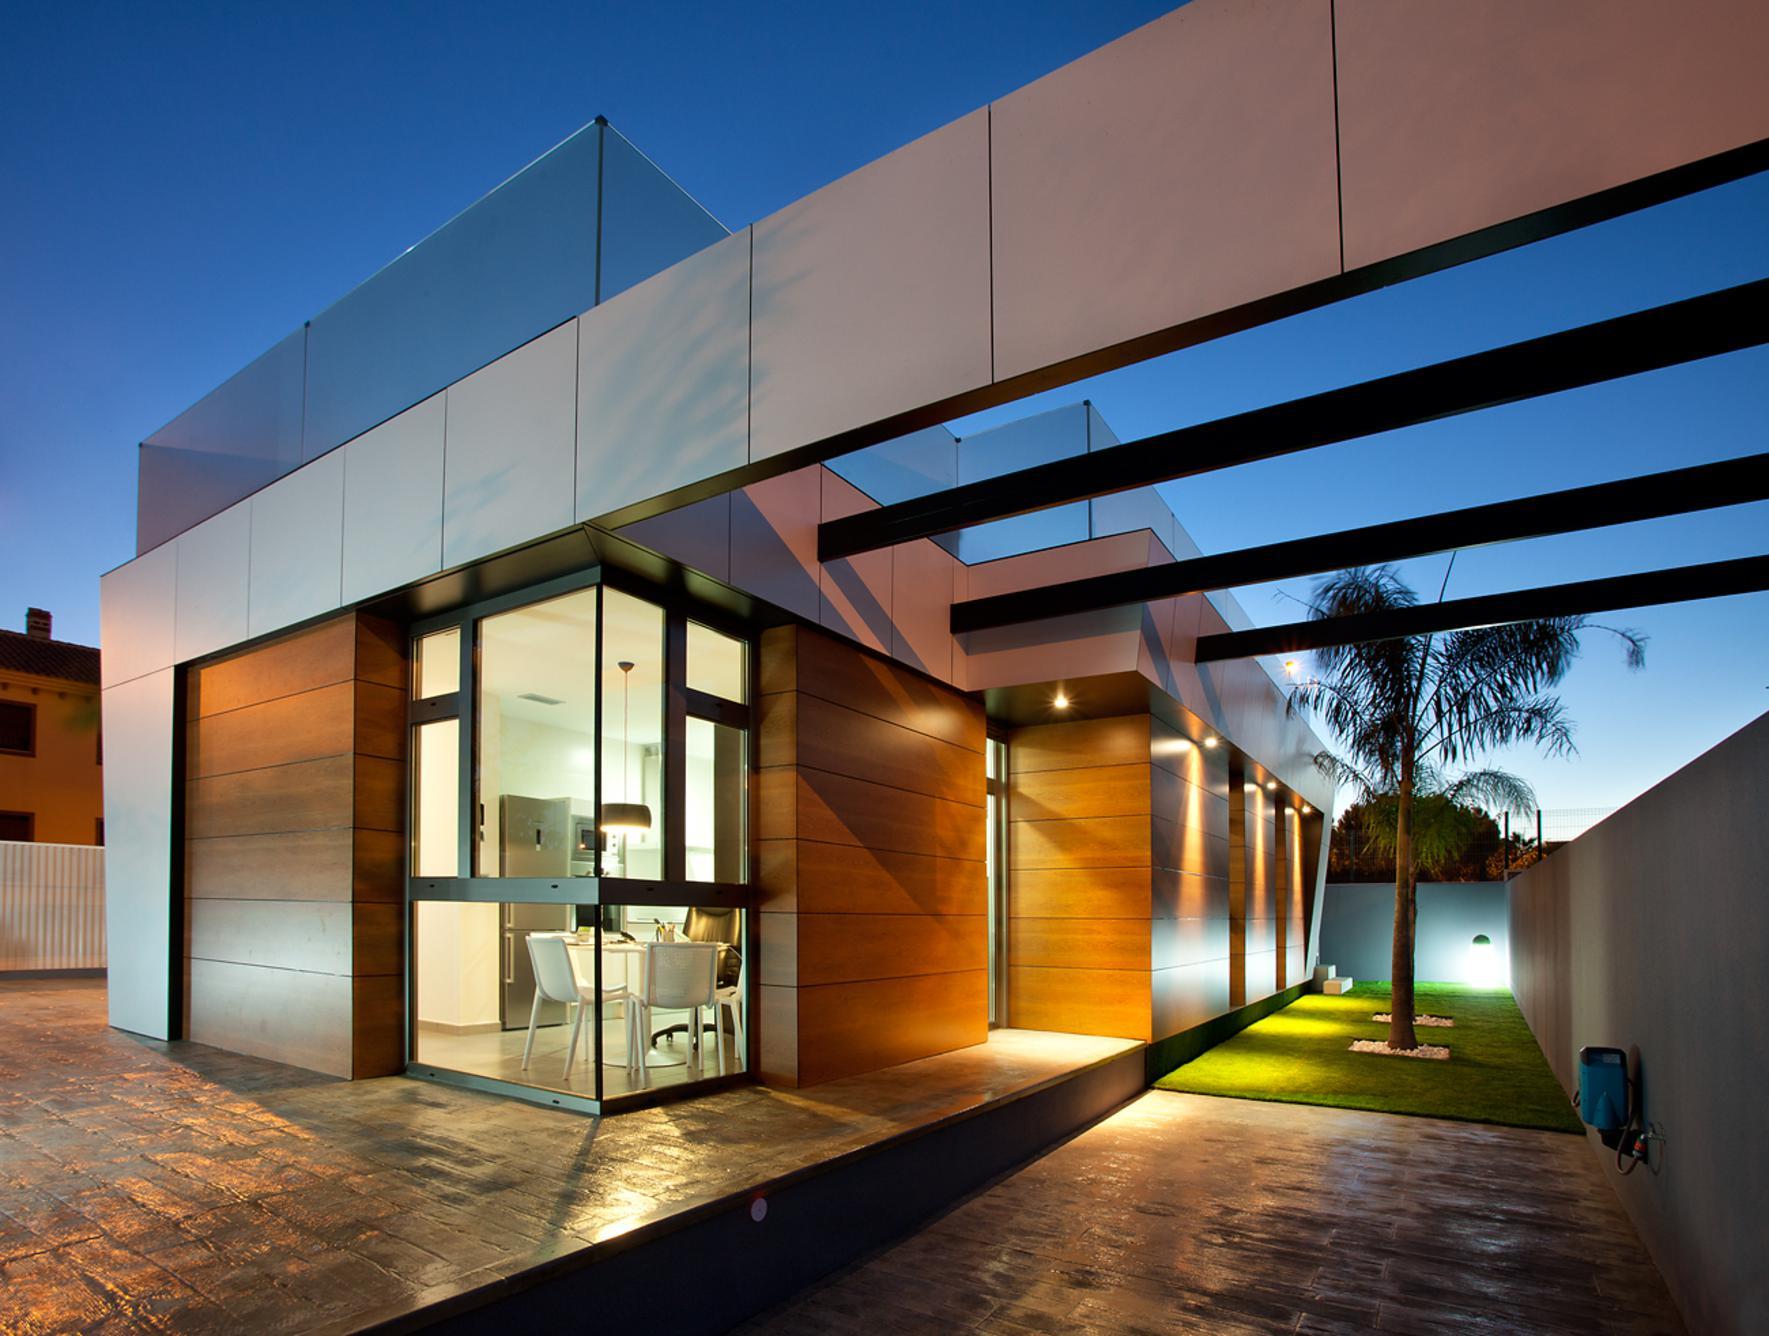 Amazing modern houses - choice of ee24.com - EE24 on Amazing Modern Houses  id=45977